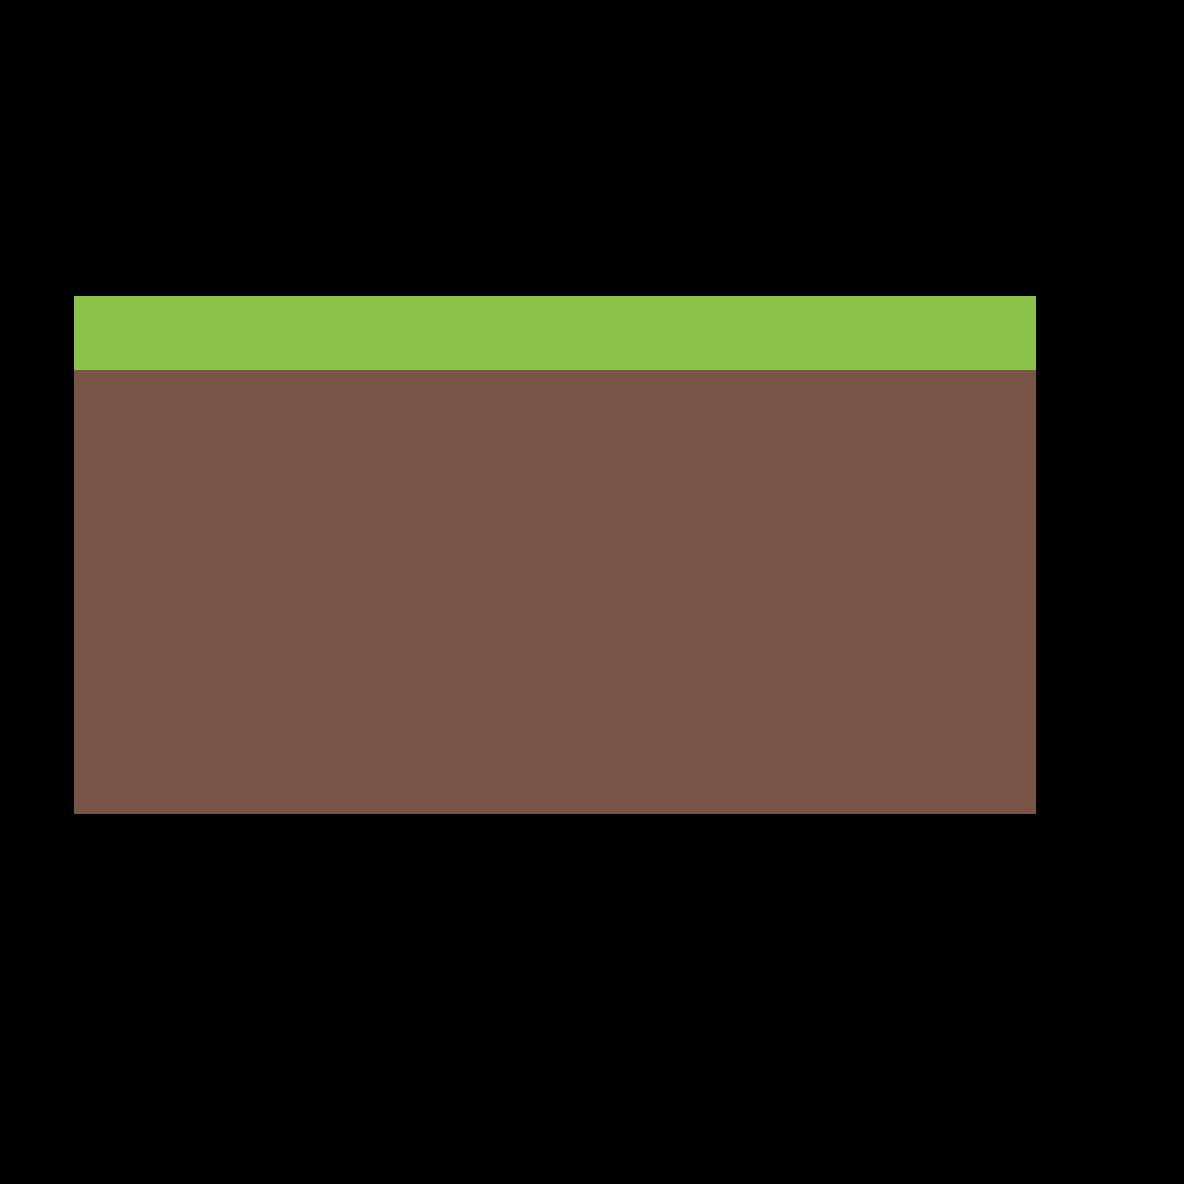 minecraft grass block by poppysky